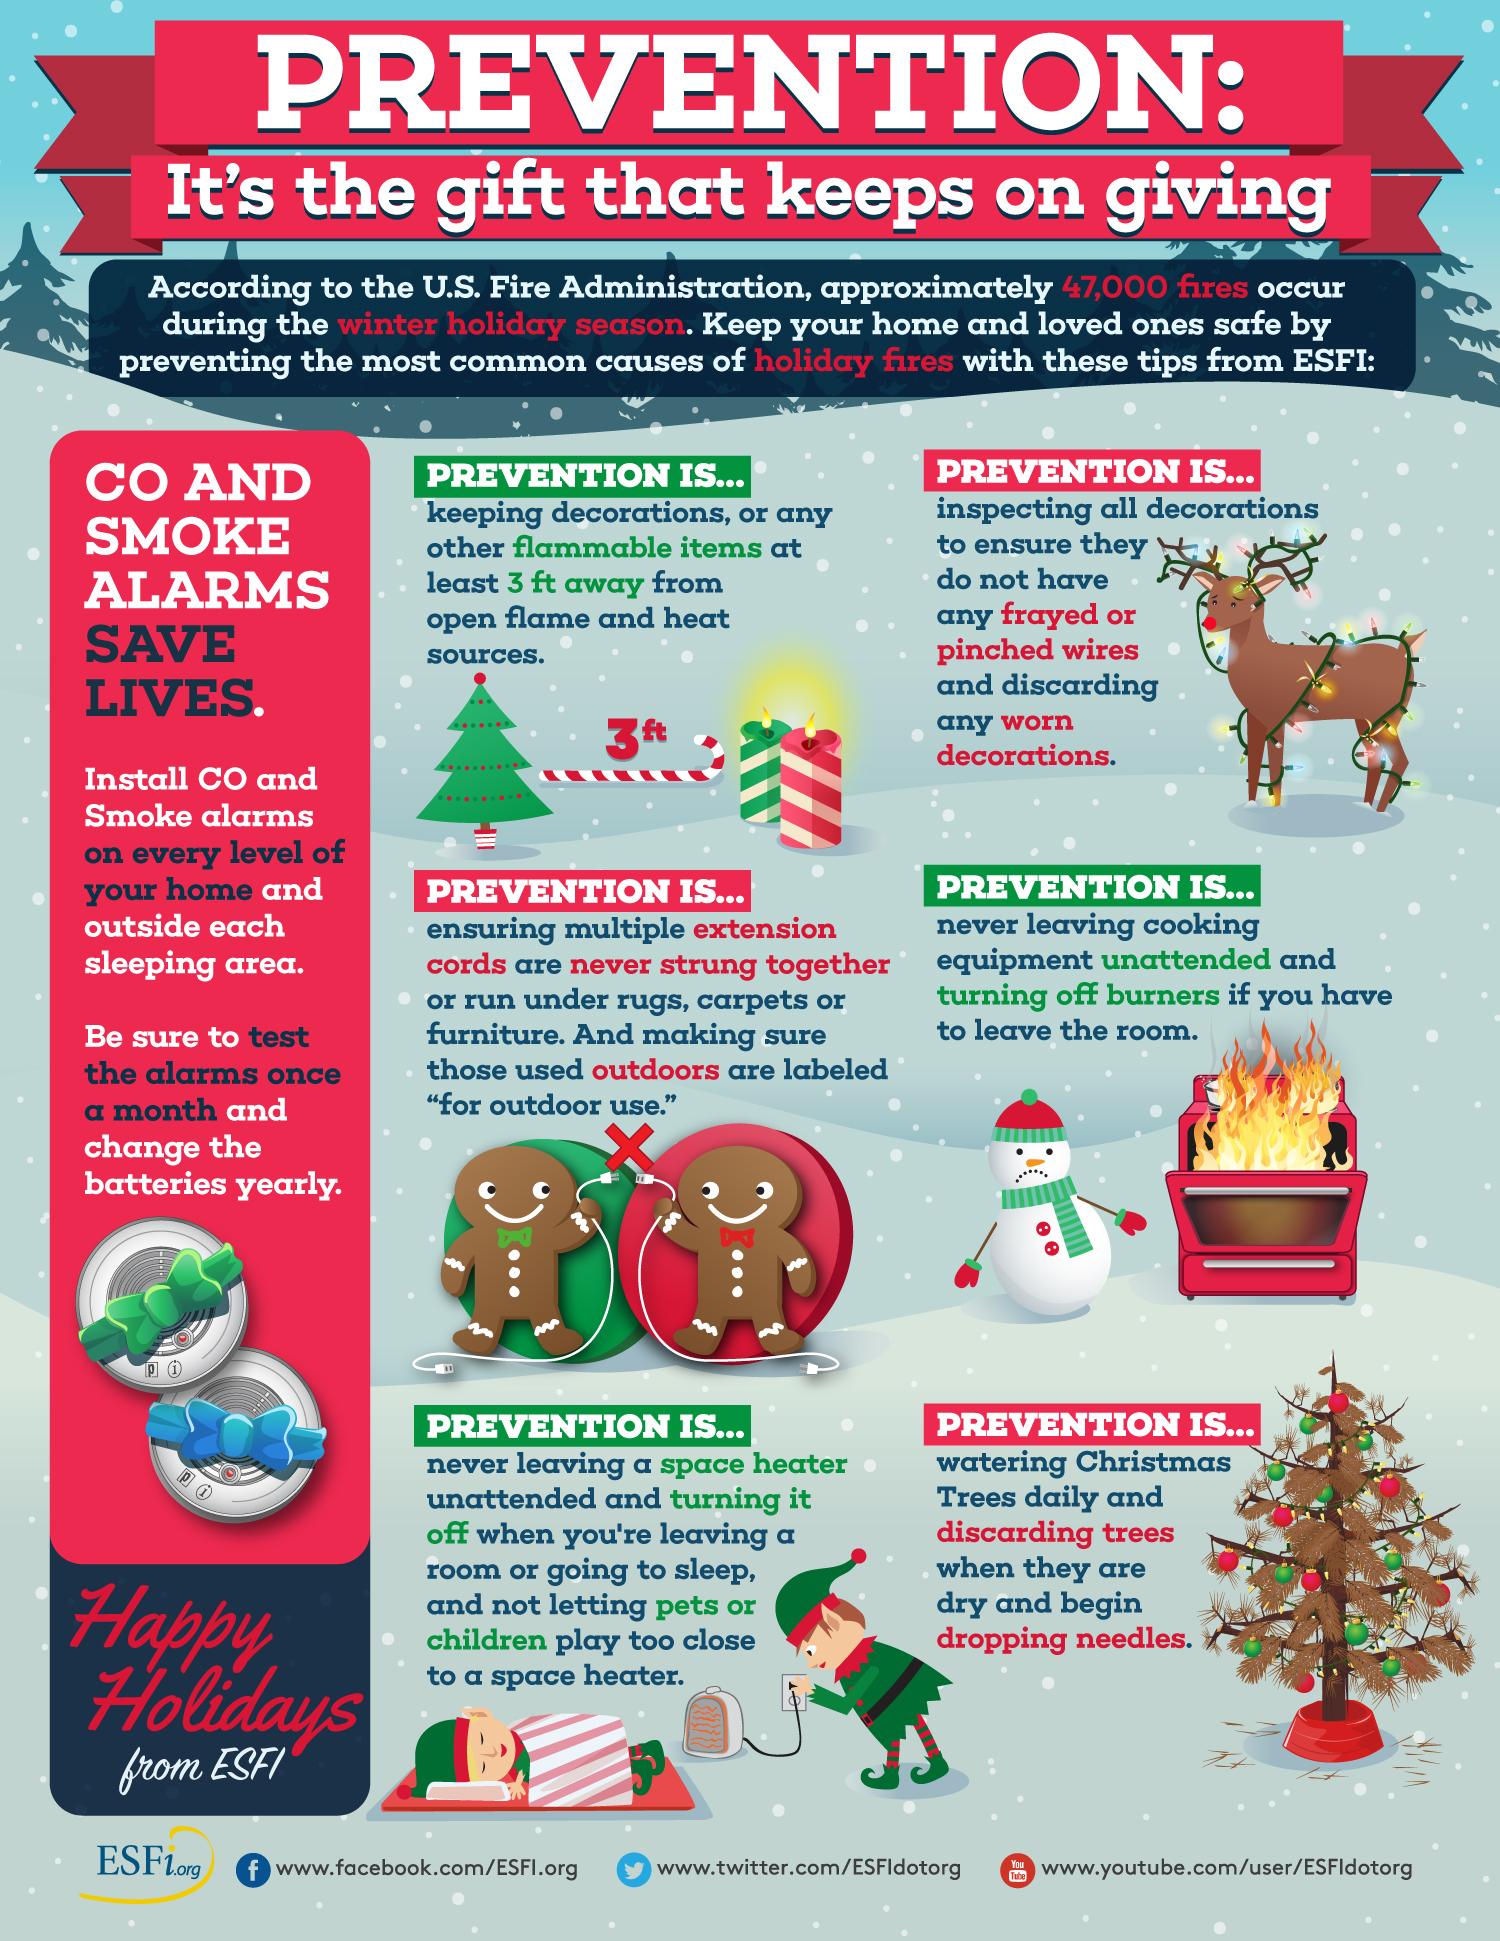 ESFI Holiday Infographic 3.jpg